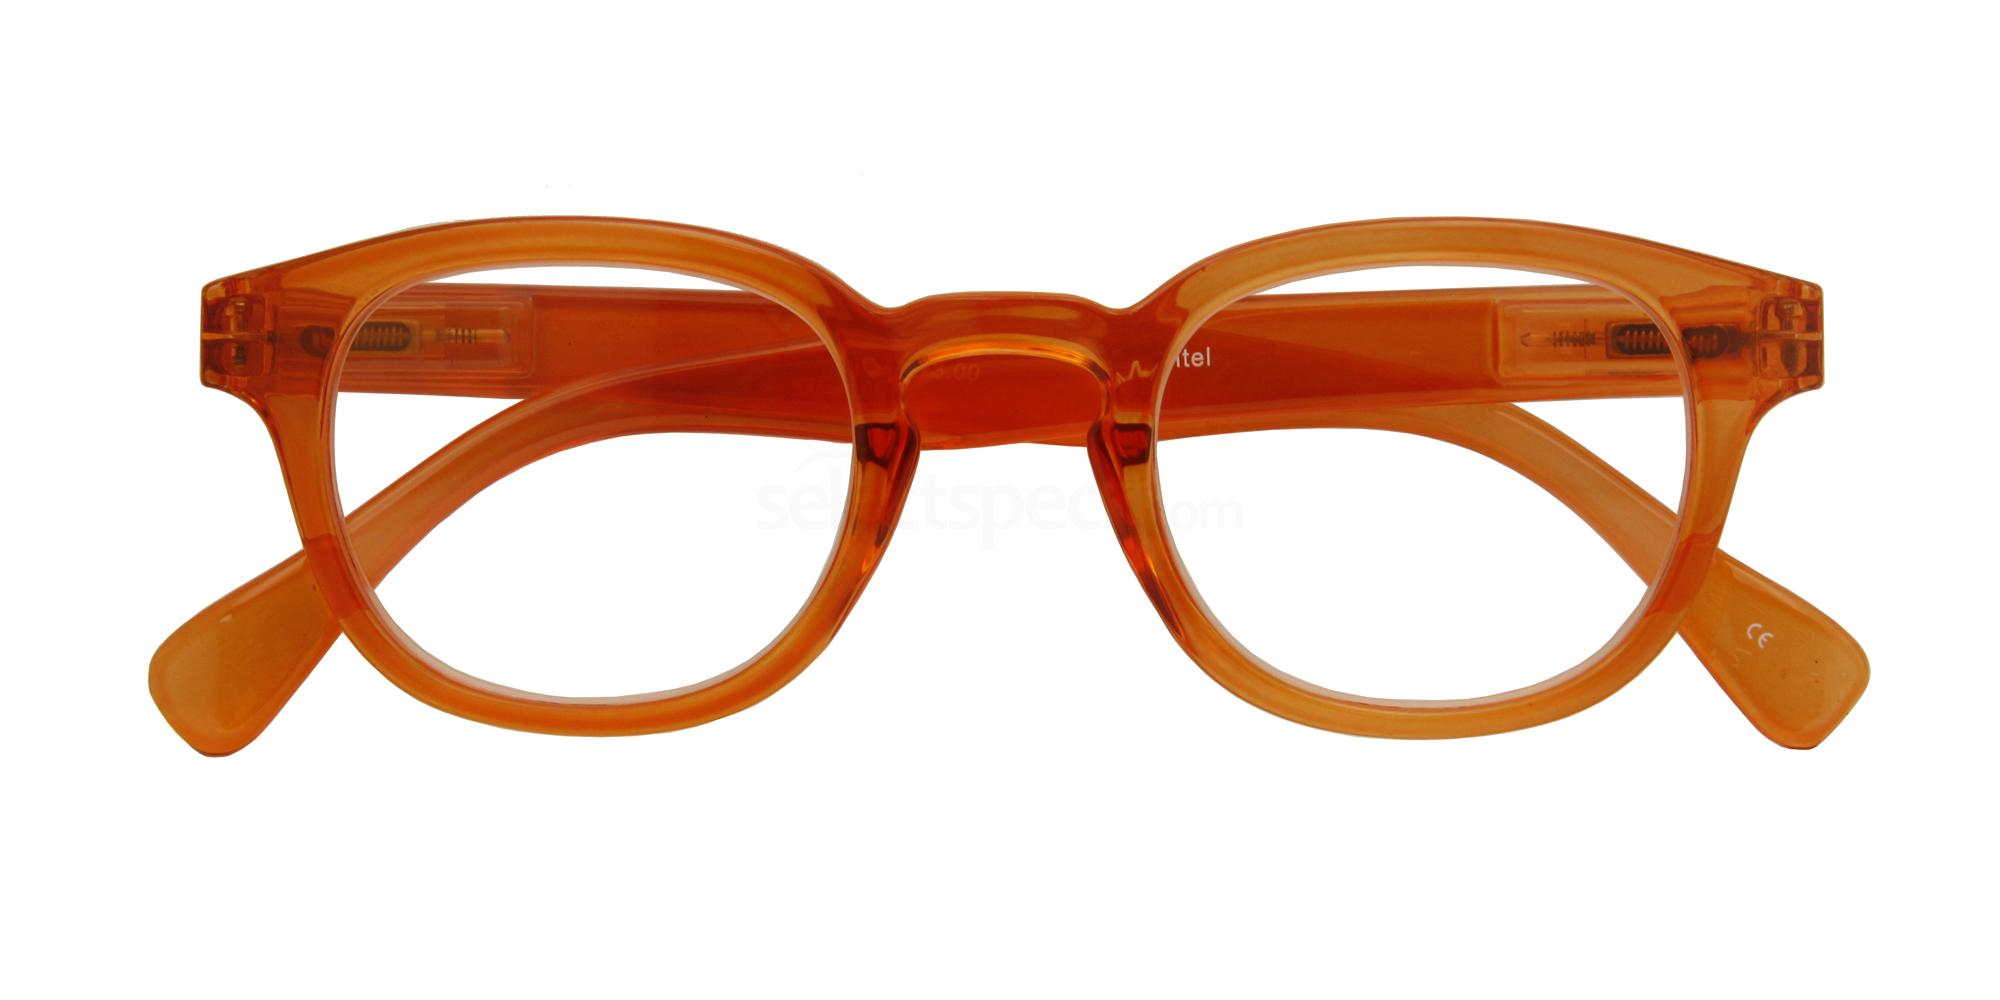 +1.00 Power Montel Orange Transparant Accessories, Croon